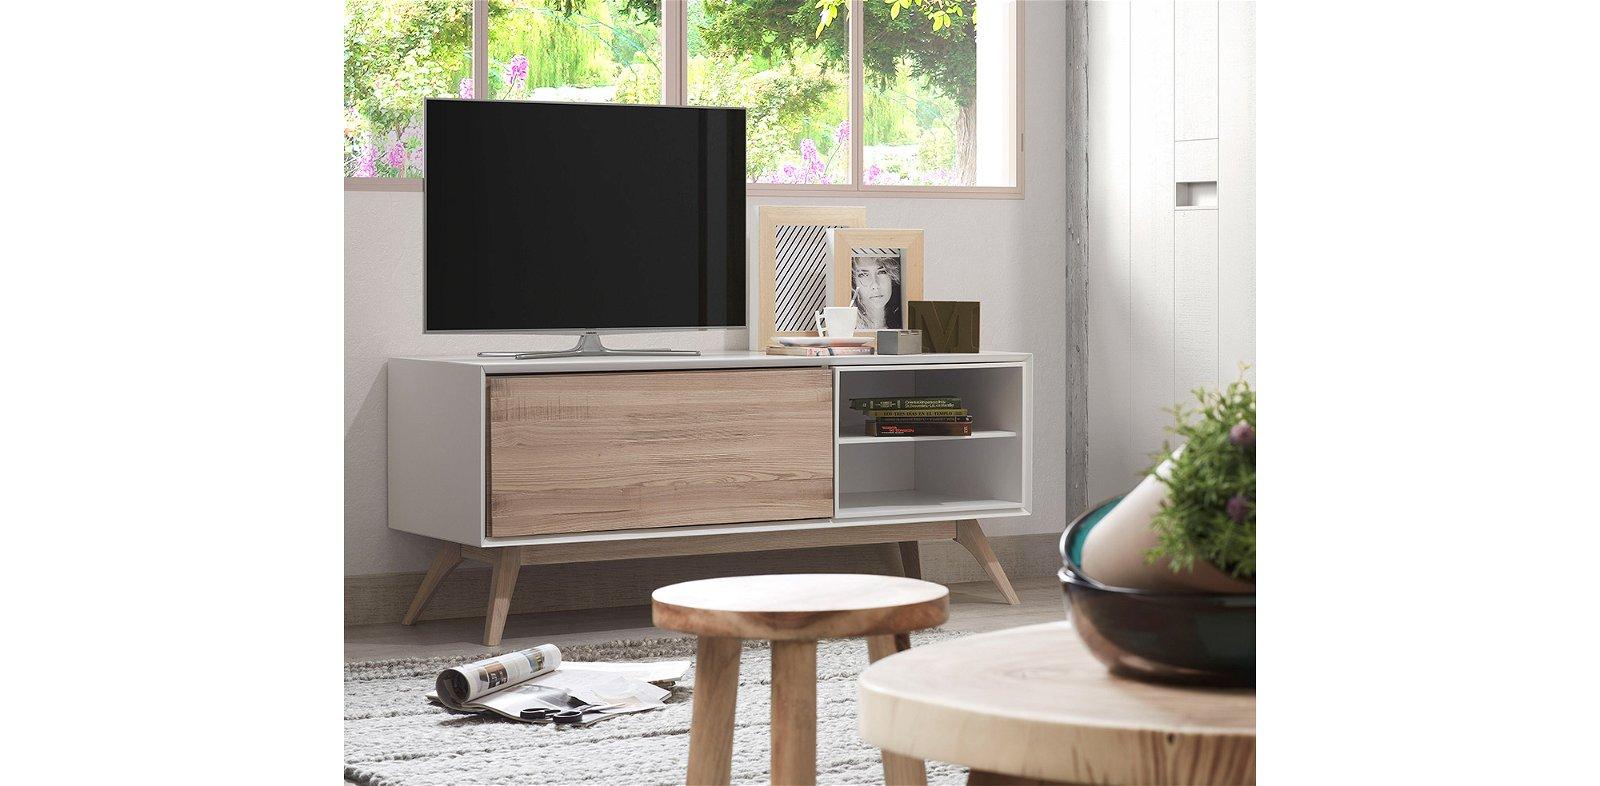 Mueble de Tv 1 puerta nordico Quatre 2